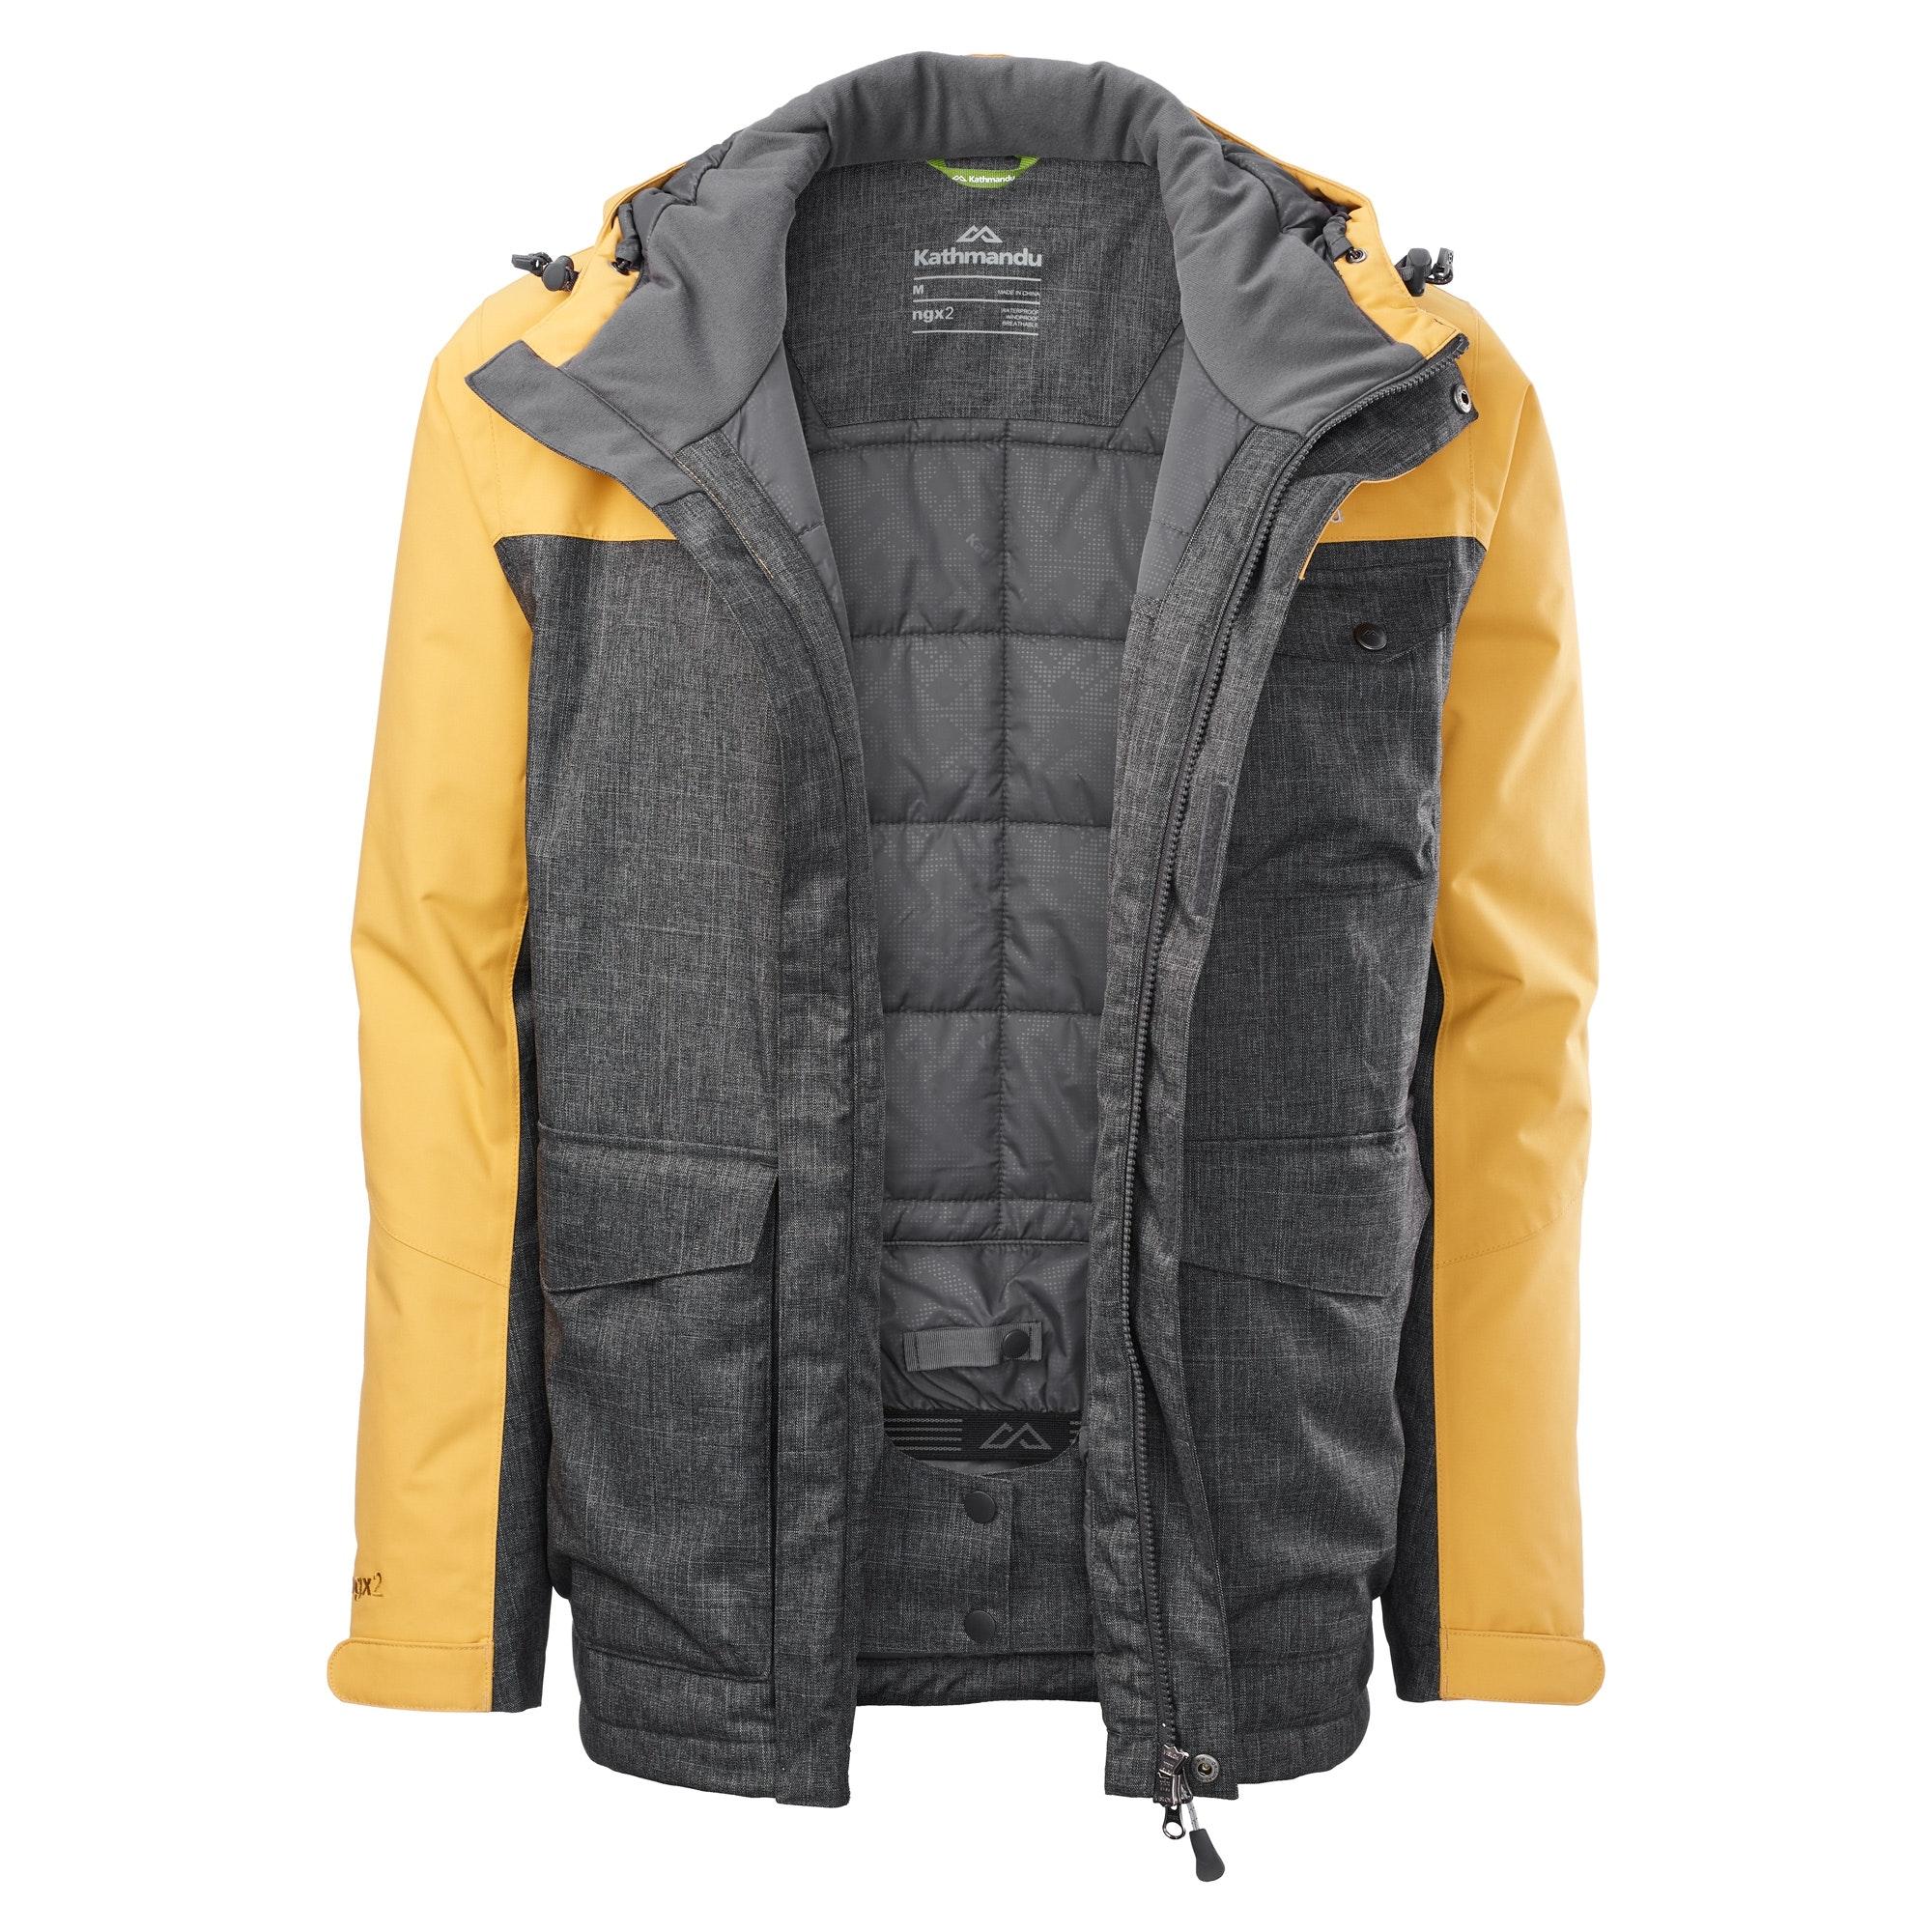 Kathmandu-Teton-Men-039-s-2-Layer-Waterproof-Snow-Ski-Hooded-Jacket-v3